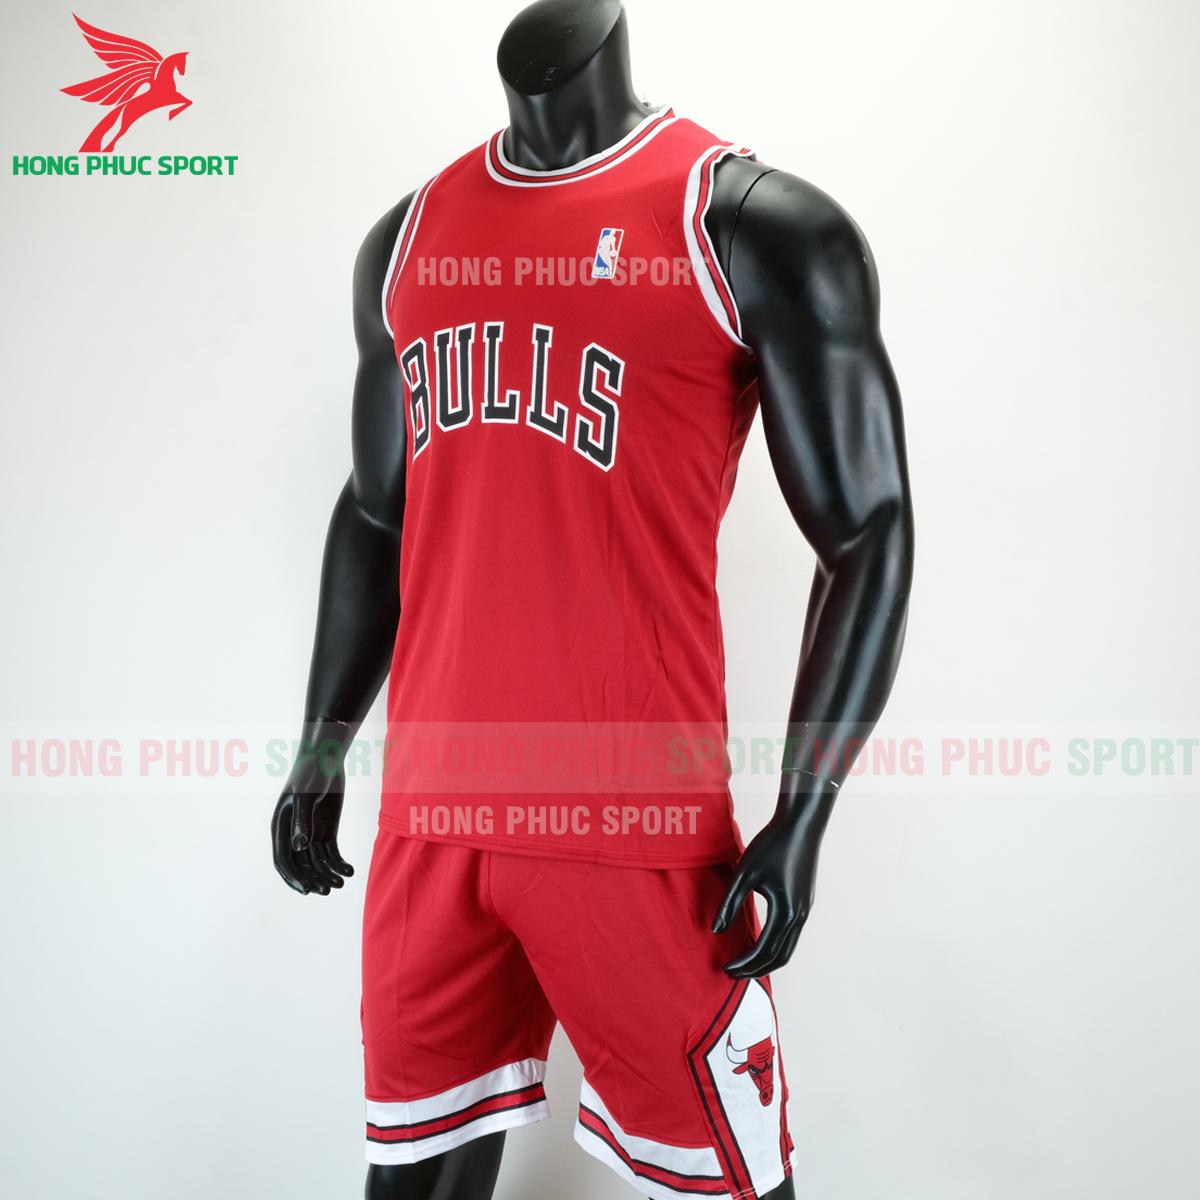 https://cdn.hongphucsport.com/unsafe/s4.shopbay.vn/files/285/ao-bong-ro-bulls-mau-do-4-5f76dc058bbf5.png